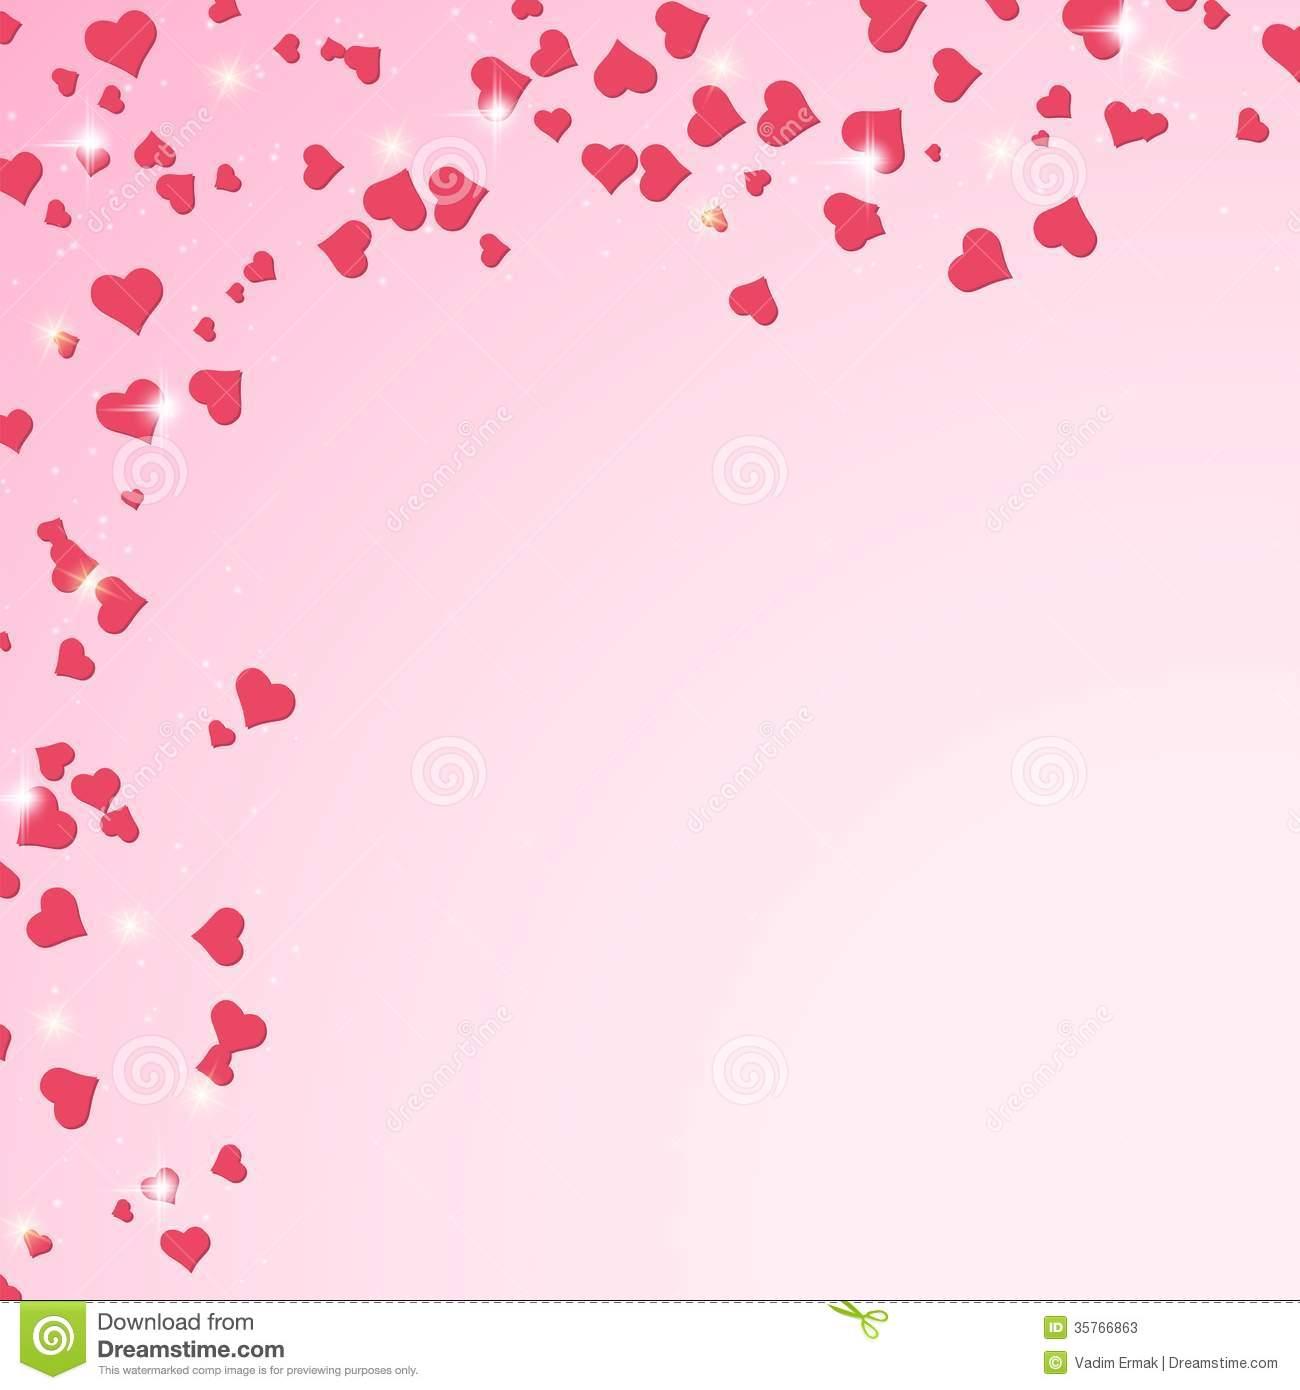 Valentine's Day Pink Hearts